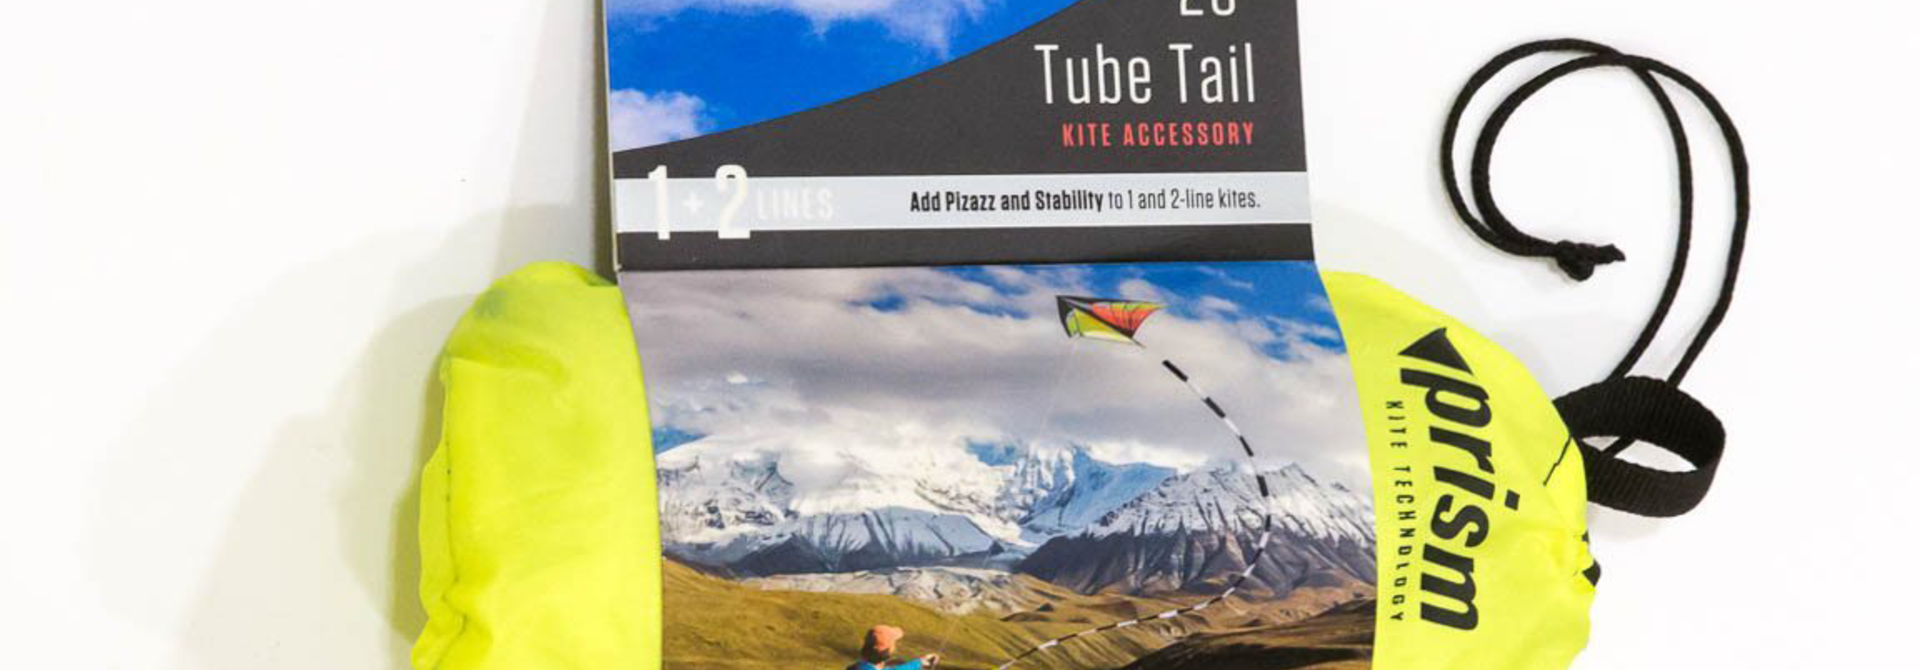 20' Tube Tail, Rainbow